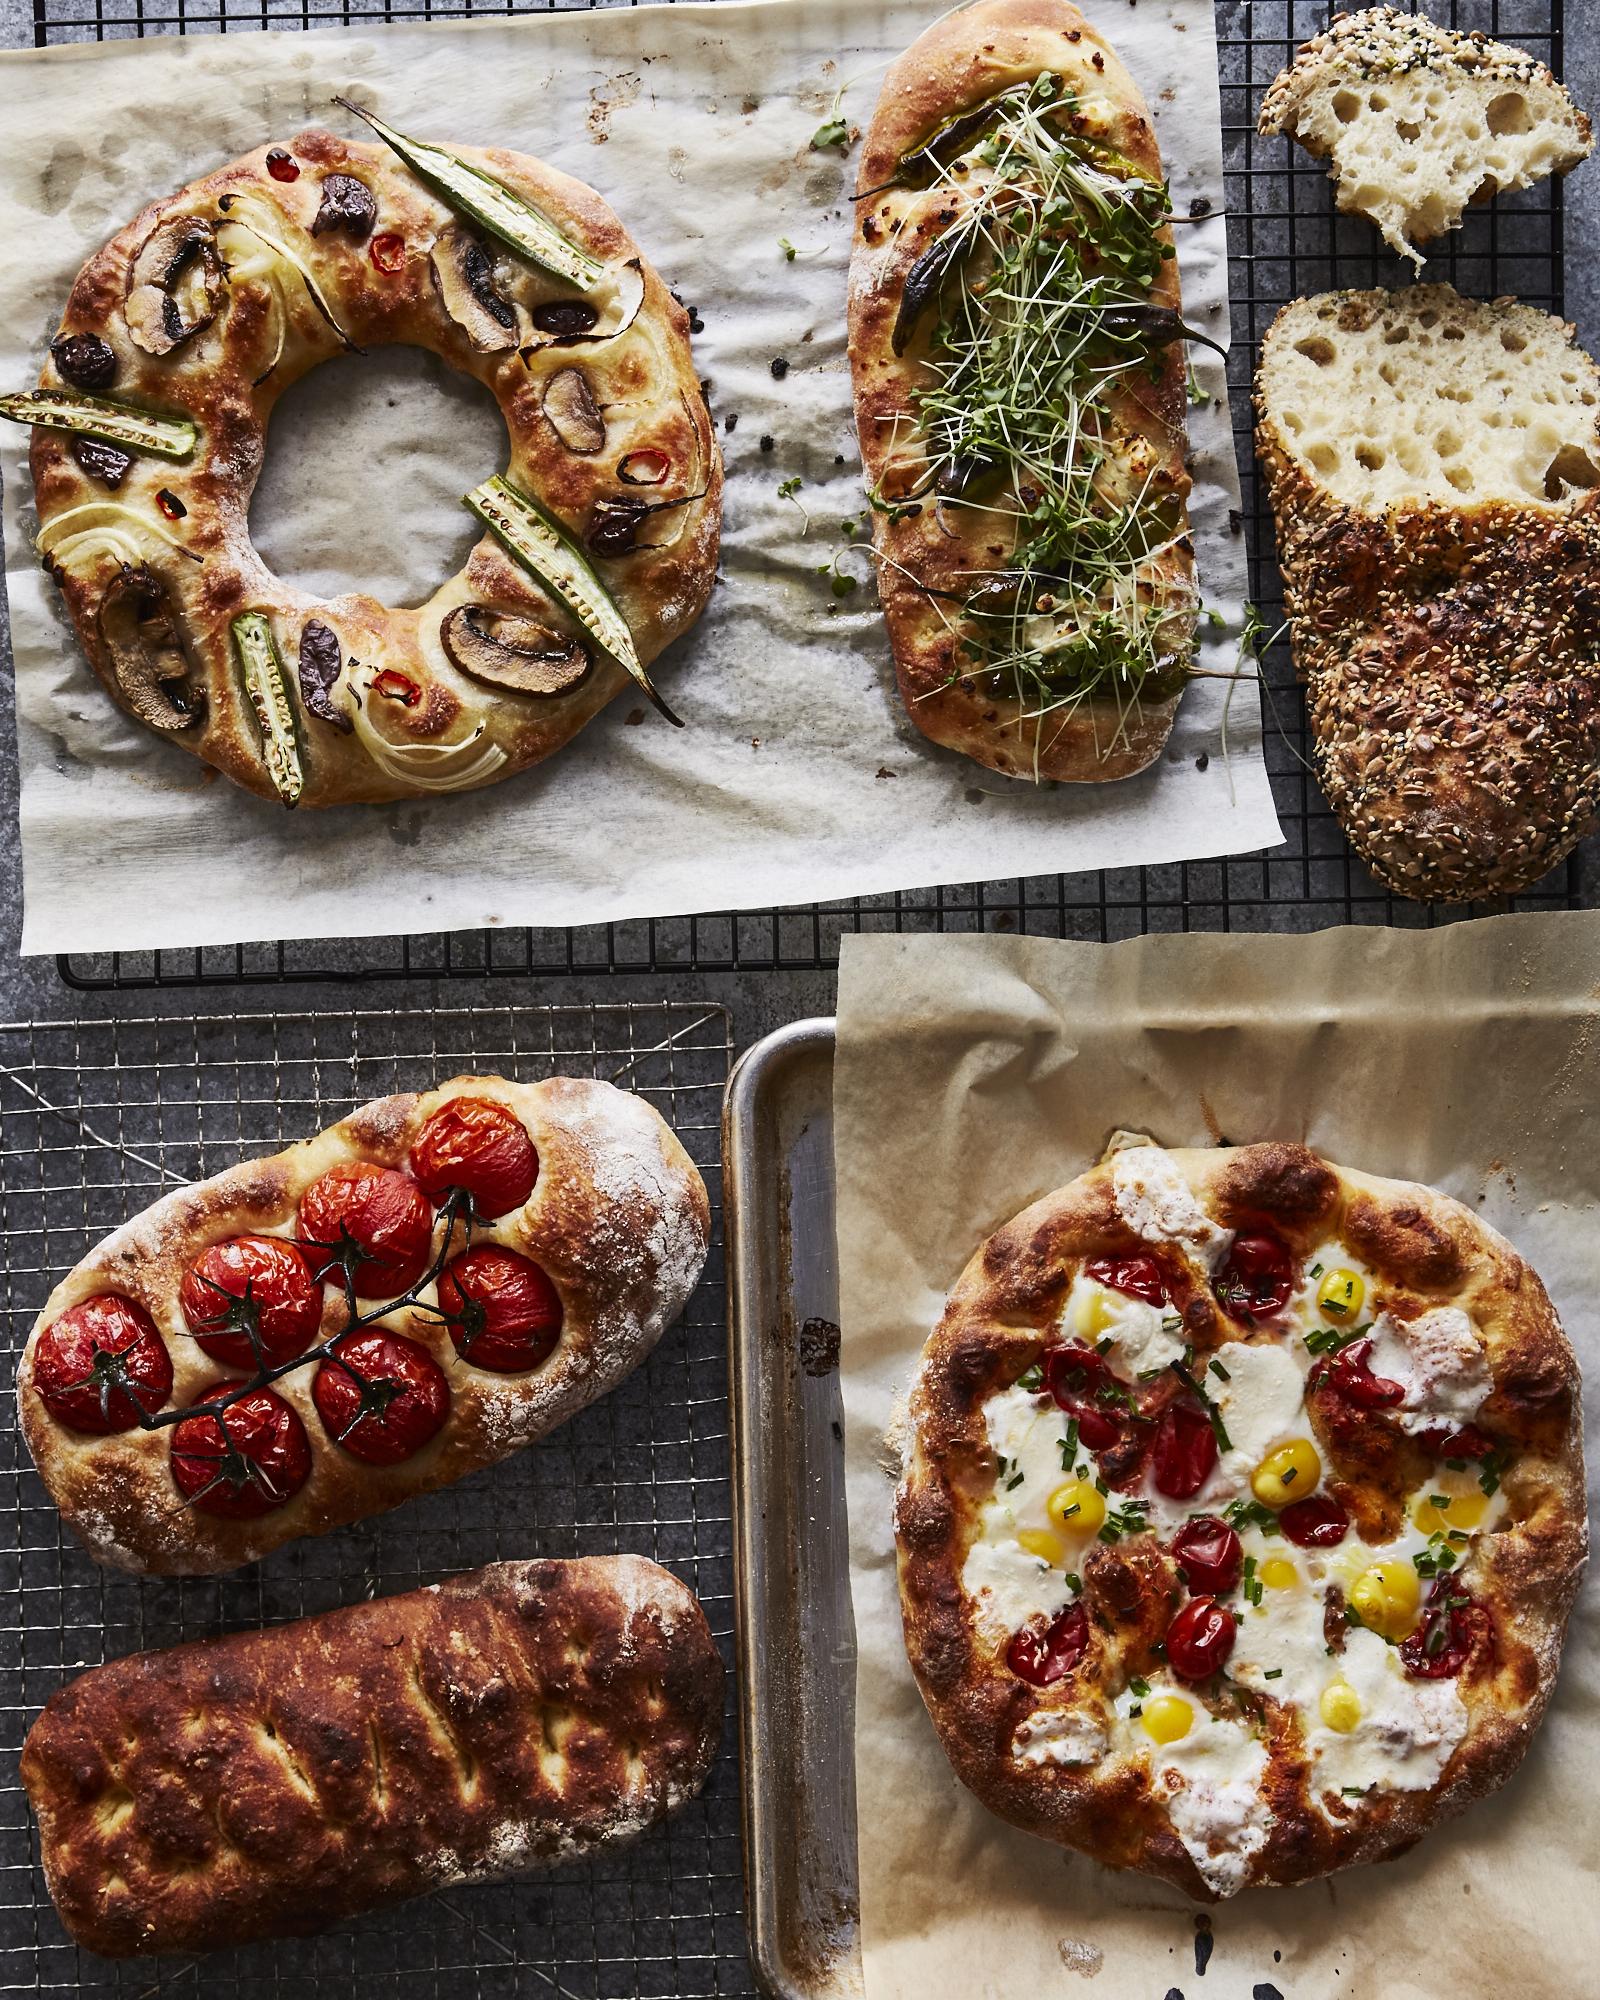 2016-1028_breads-bakery_bobbi-lin_10866.jpg